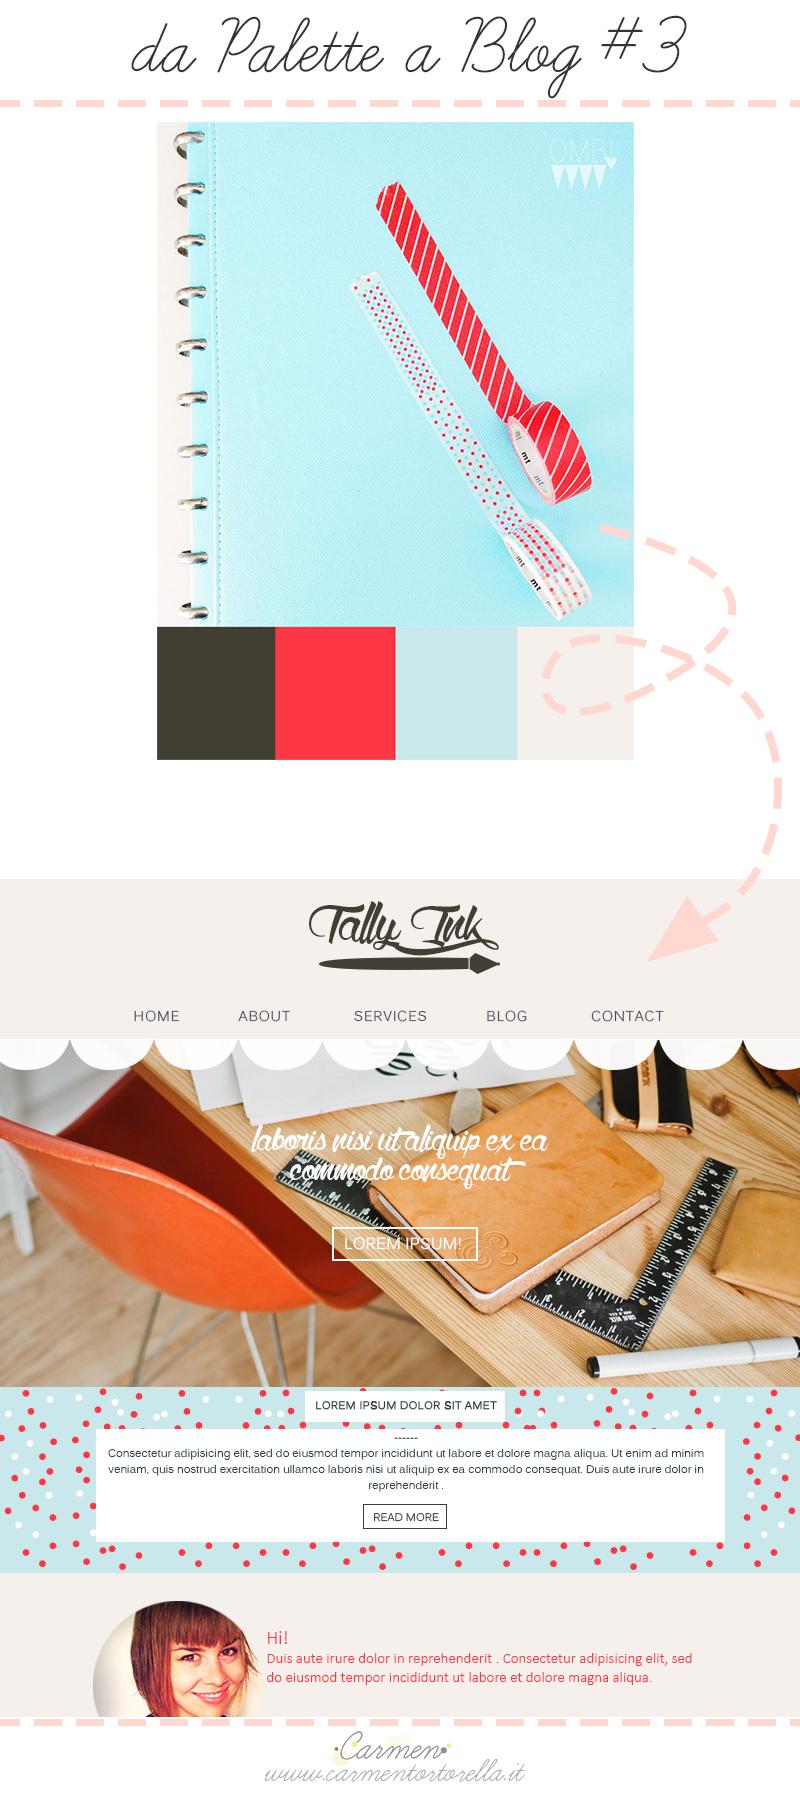 Da Palette a Blog design #2